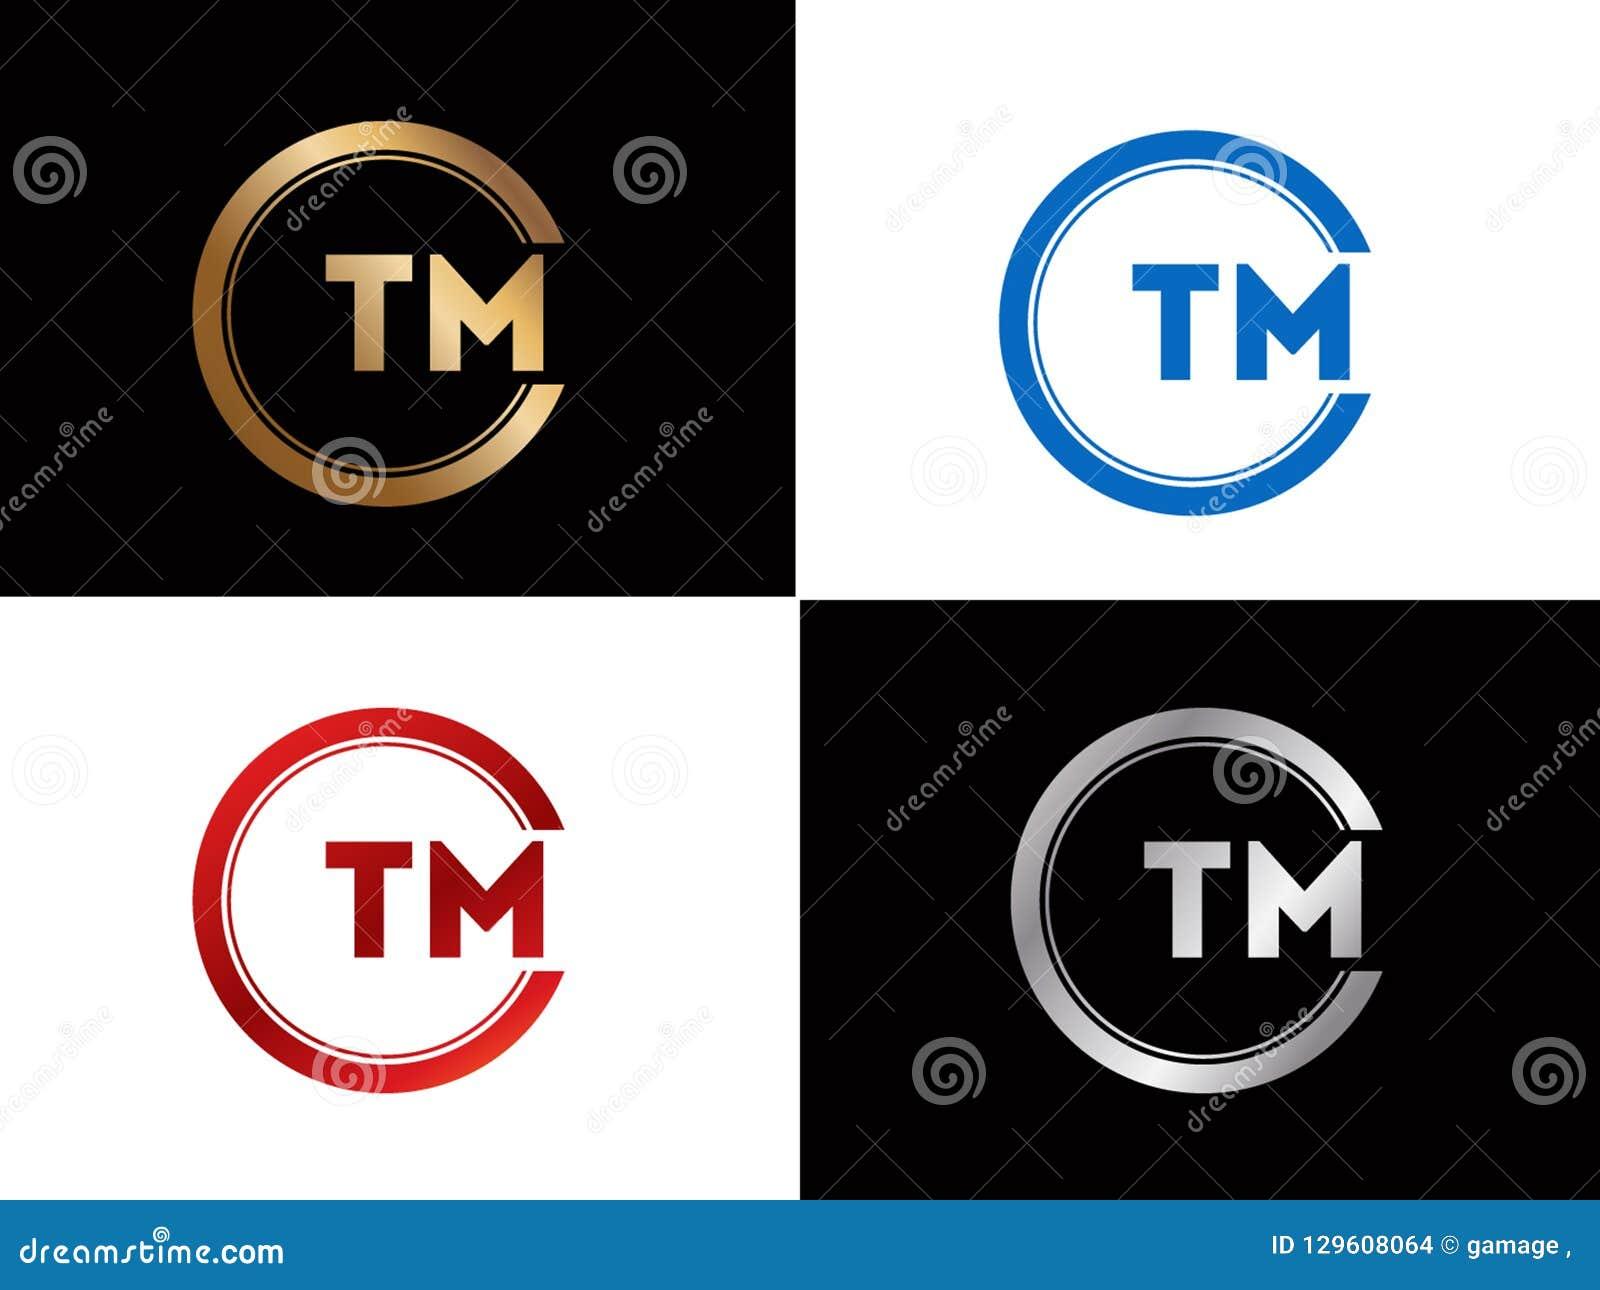 TM-Textgoldschwarze silberne moderne kreative Alphabetbuchstabelogoentwurfs-Vektorikone